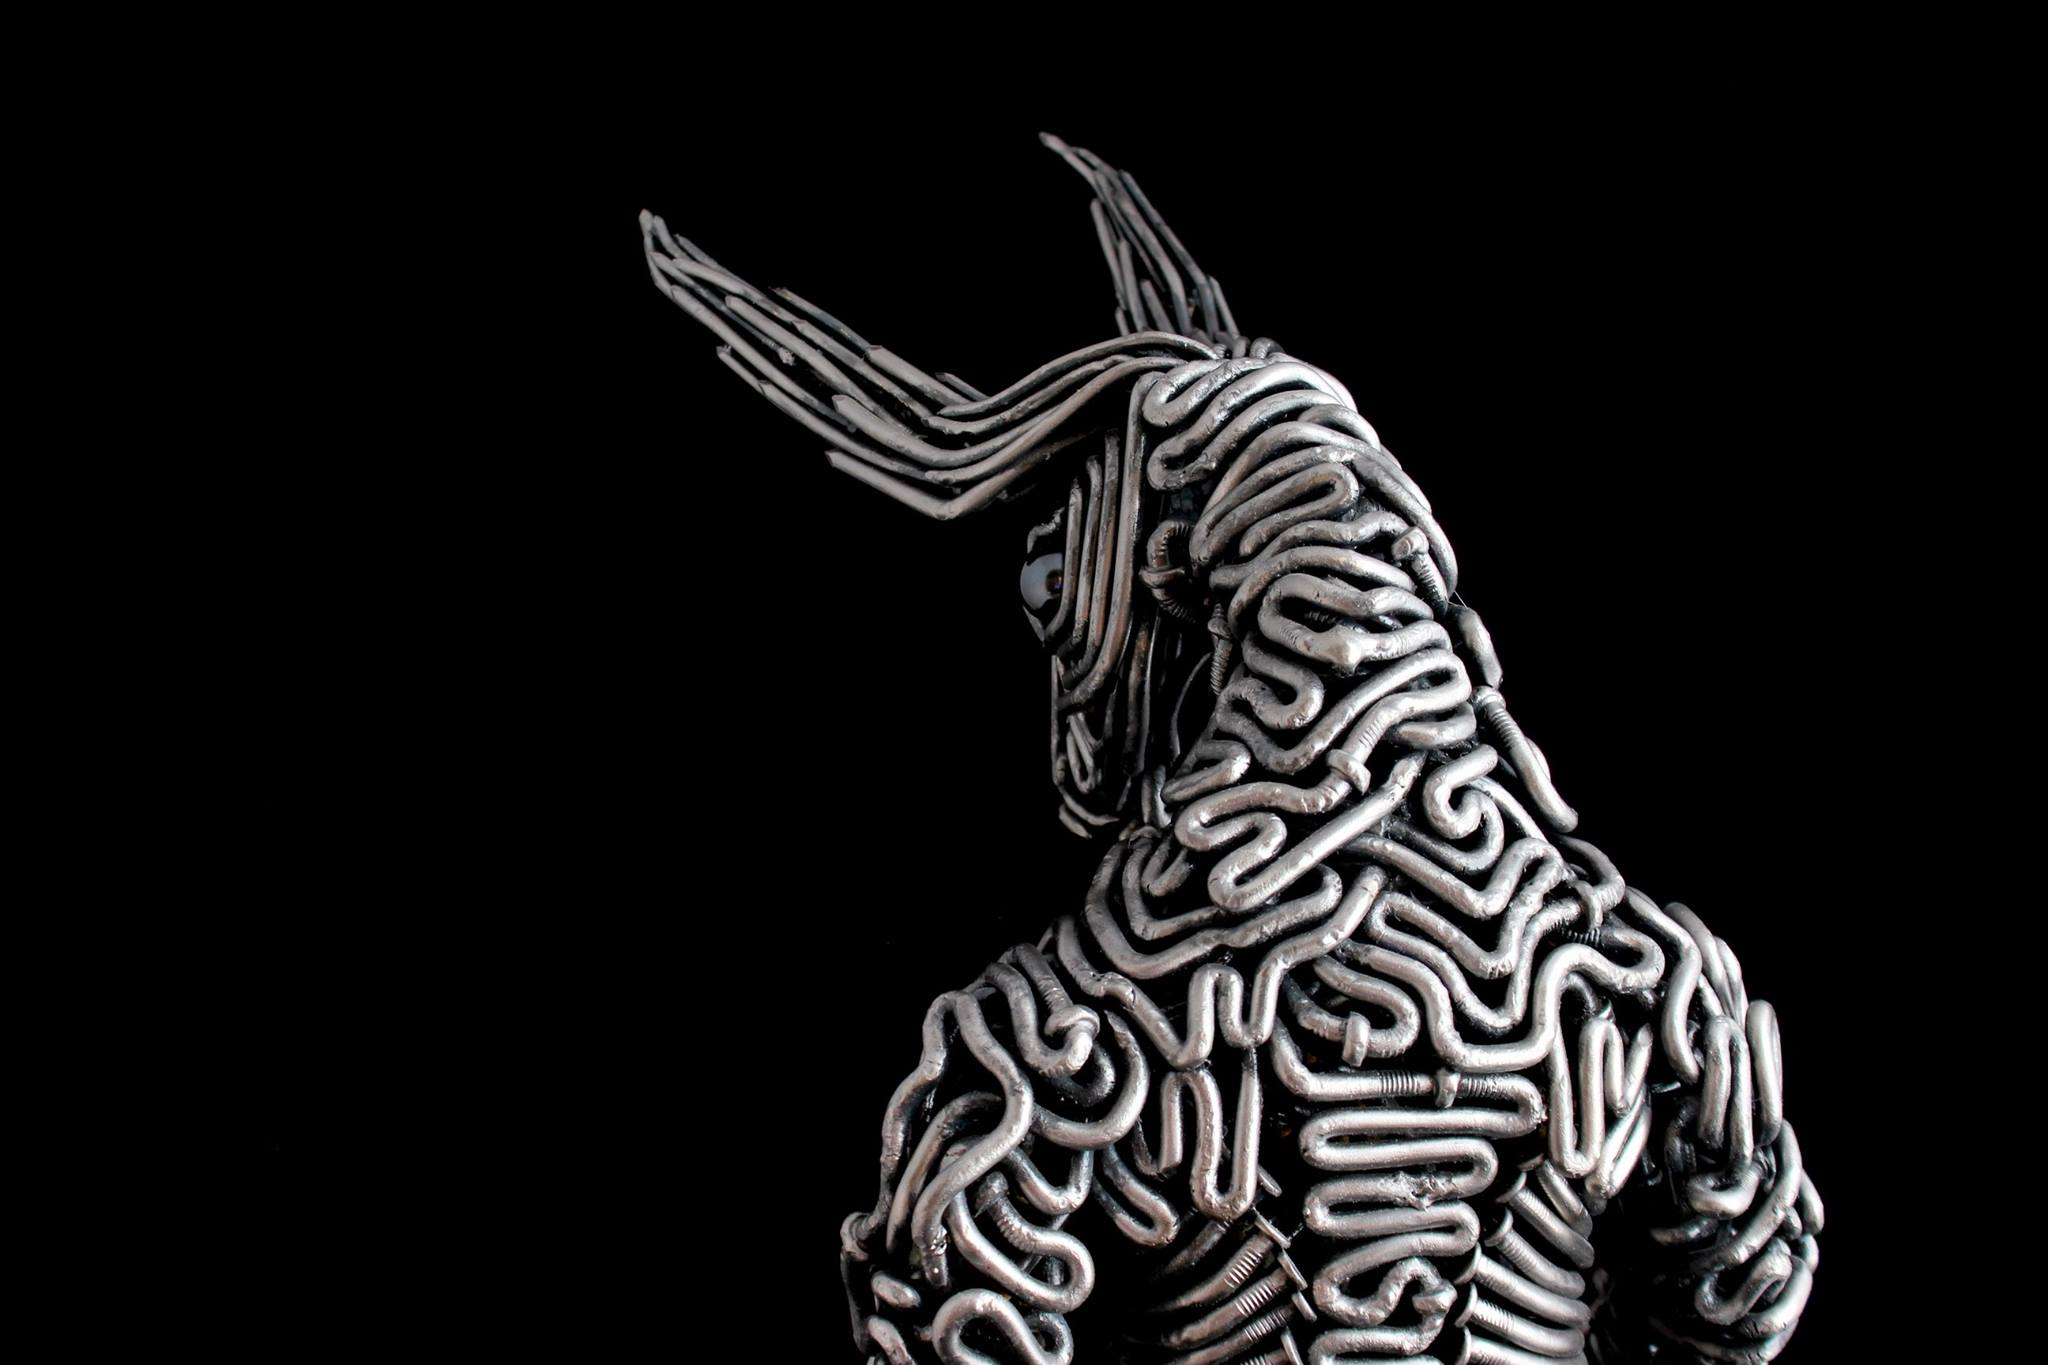 Minotaur Steel Sculpture - McCallister Sculpture - Arizona